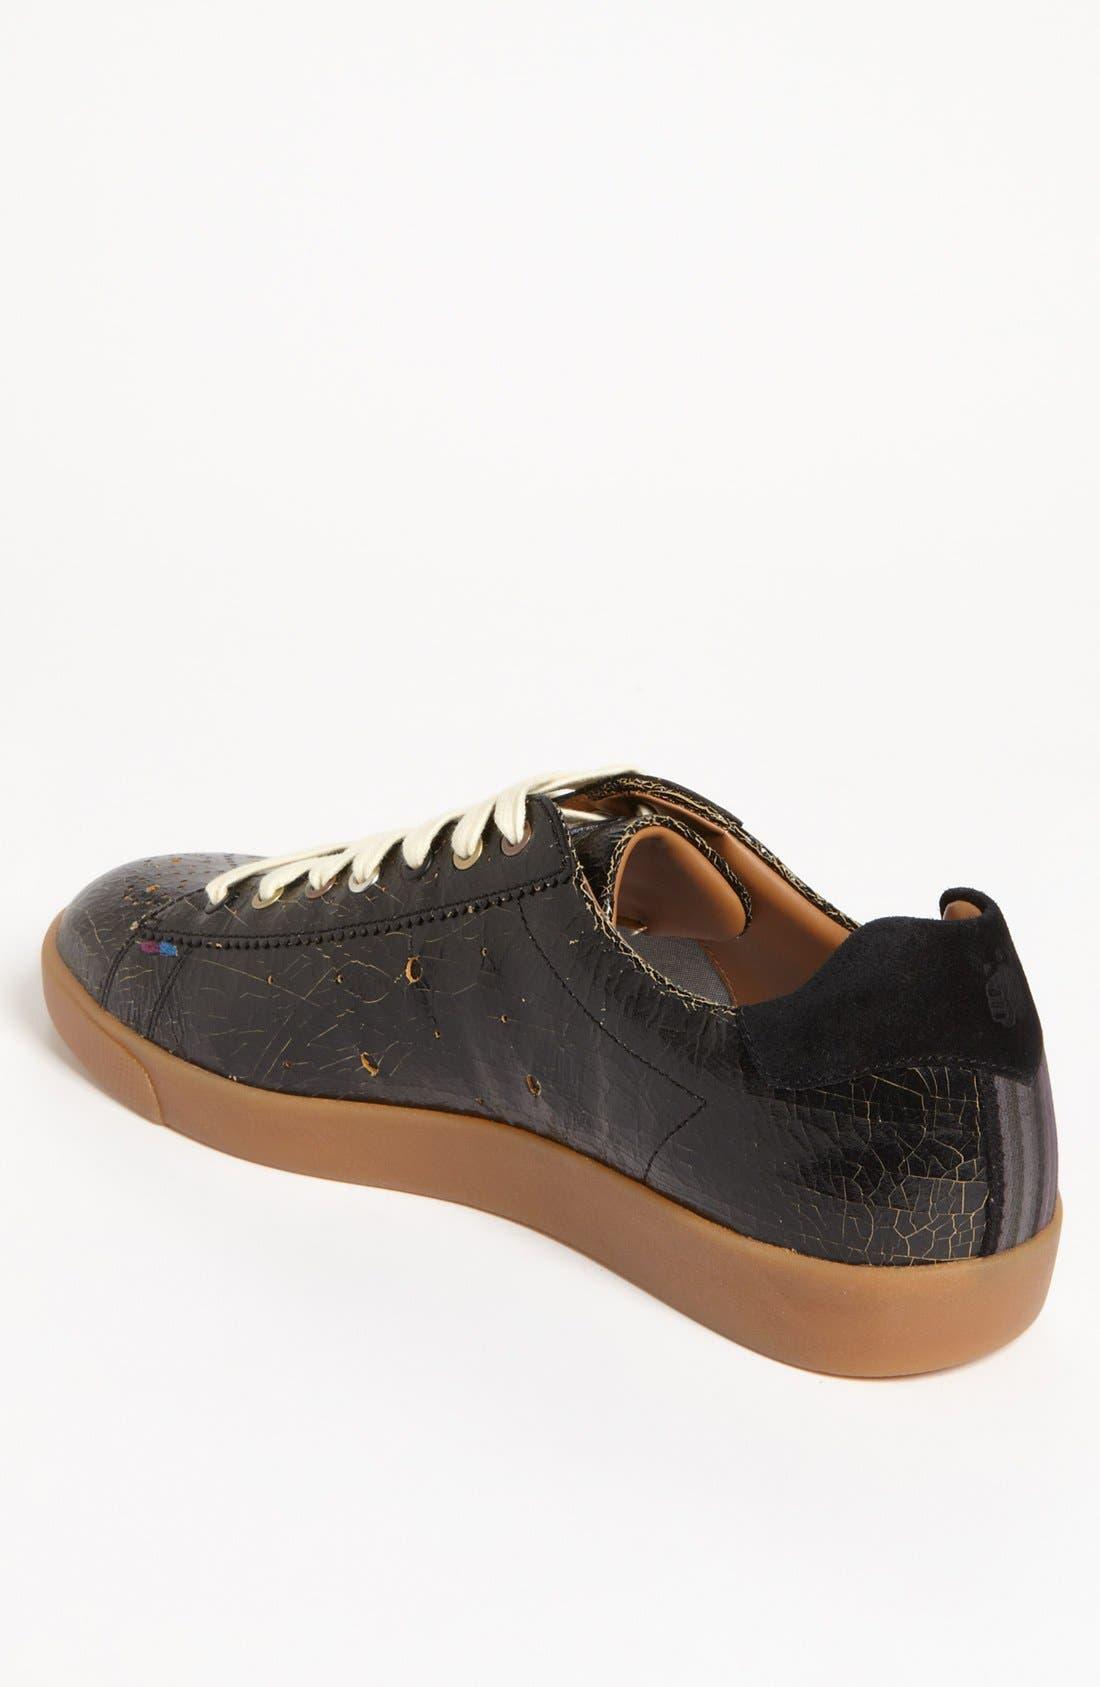 Alternate Image 2  - Paul Smith 'Lepus Old Boy' Sneaker